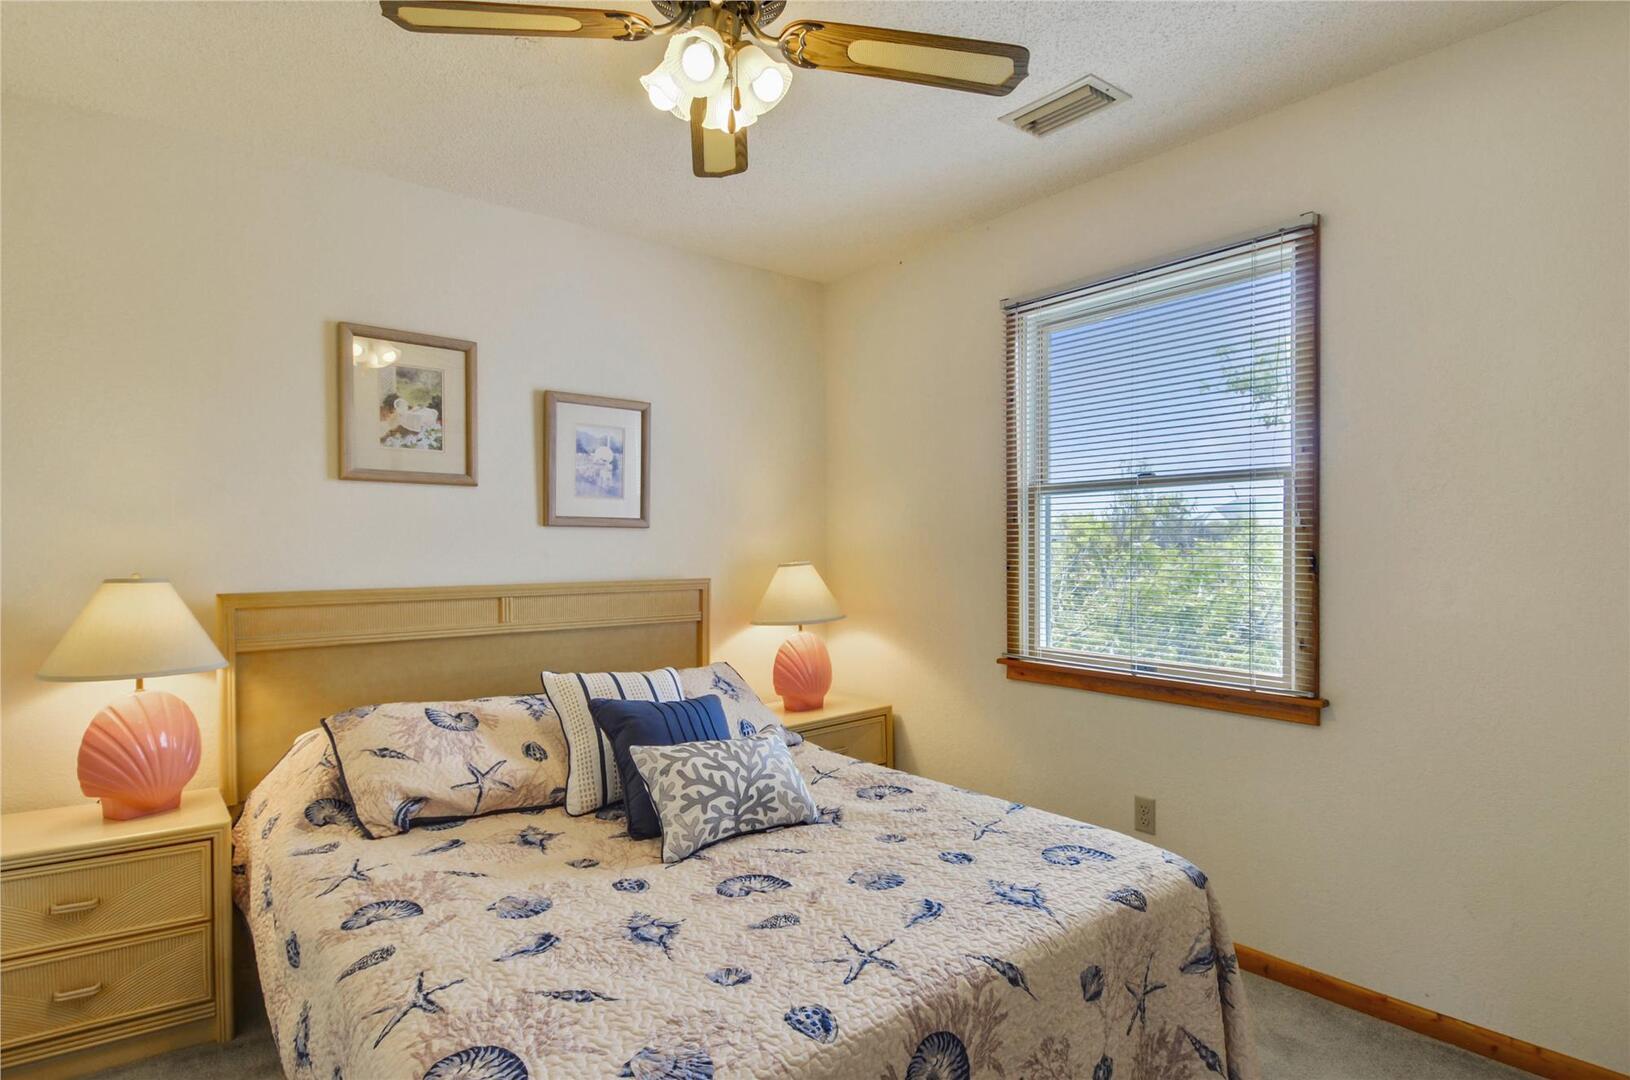 Main/Upper Level,Bedroom,